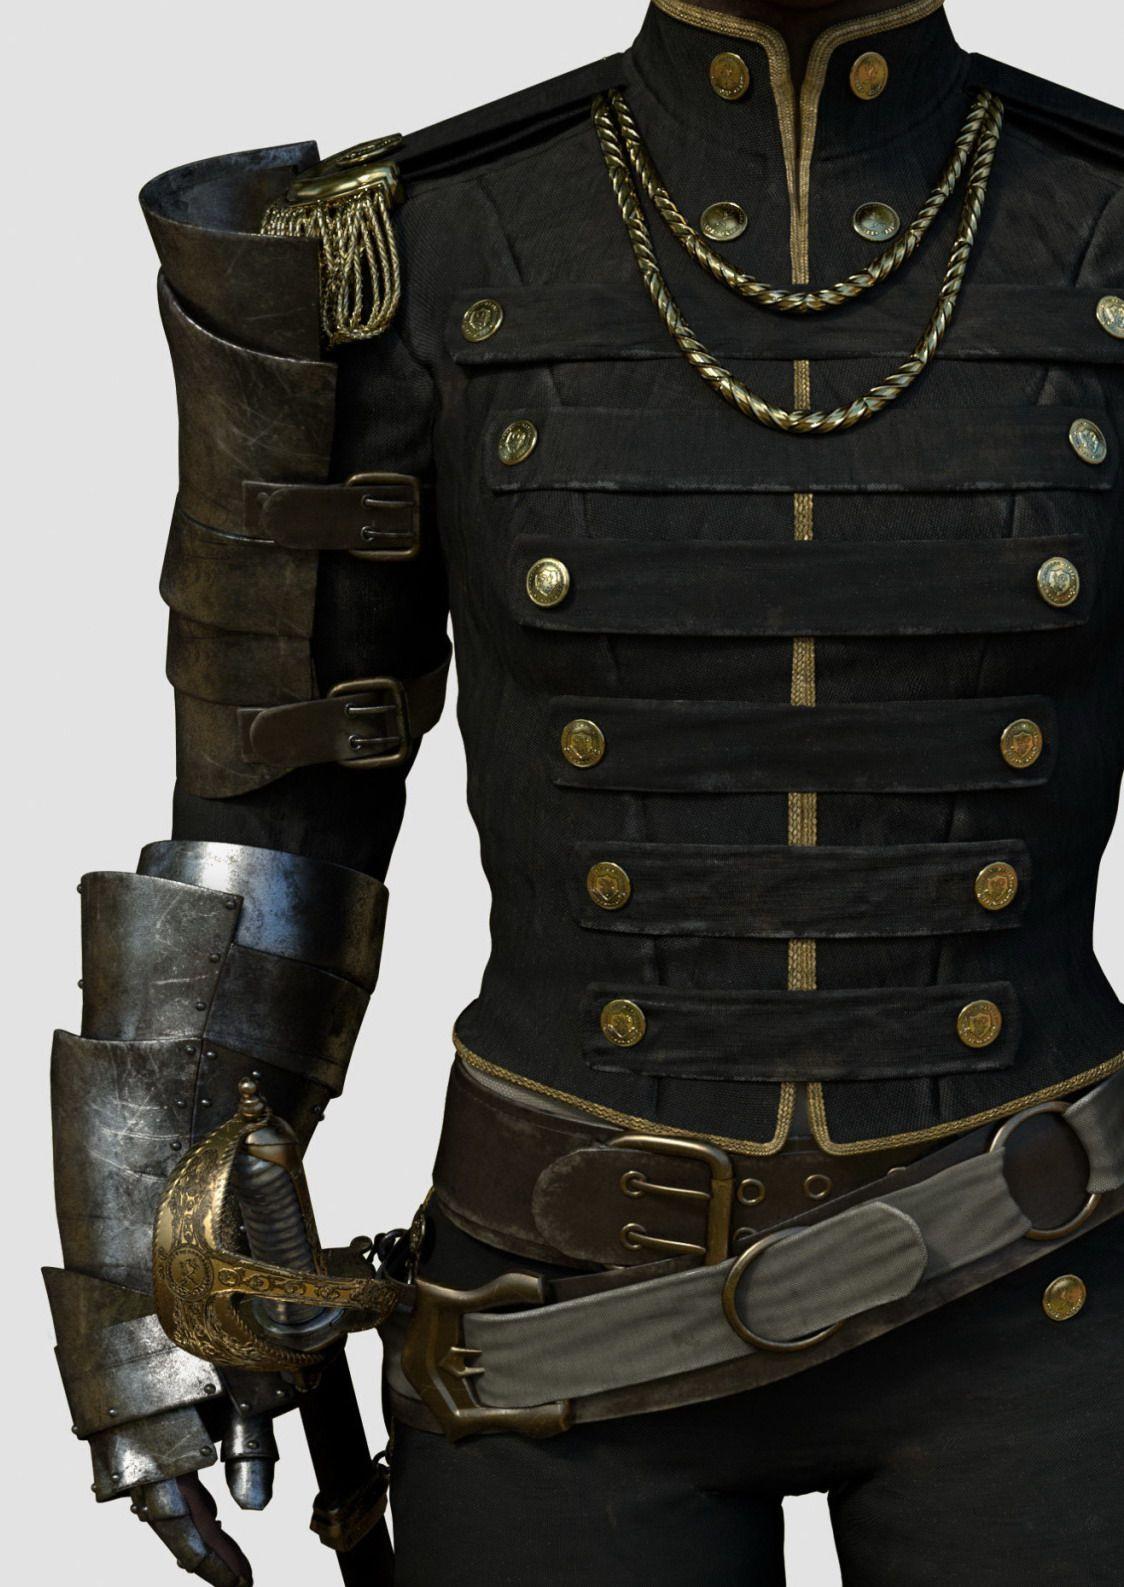 Steampunk Fashion: Pin By Steampunk Artifacts On Steampunk